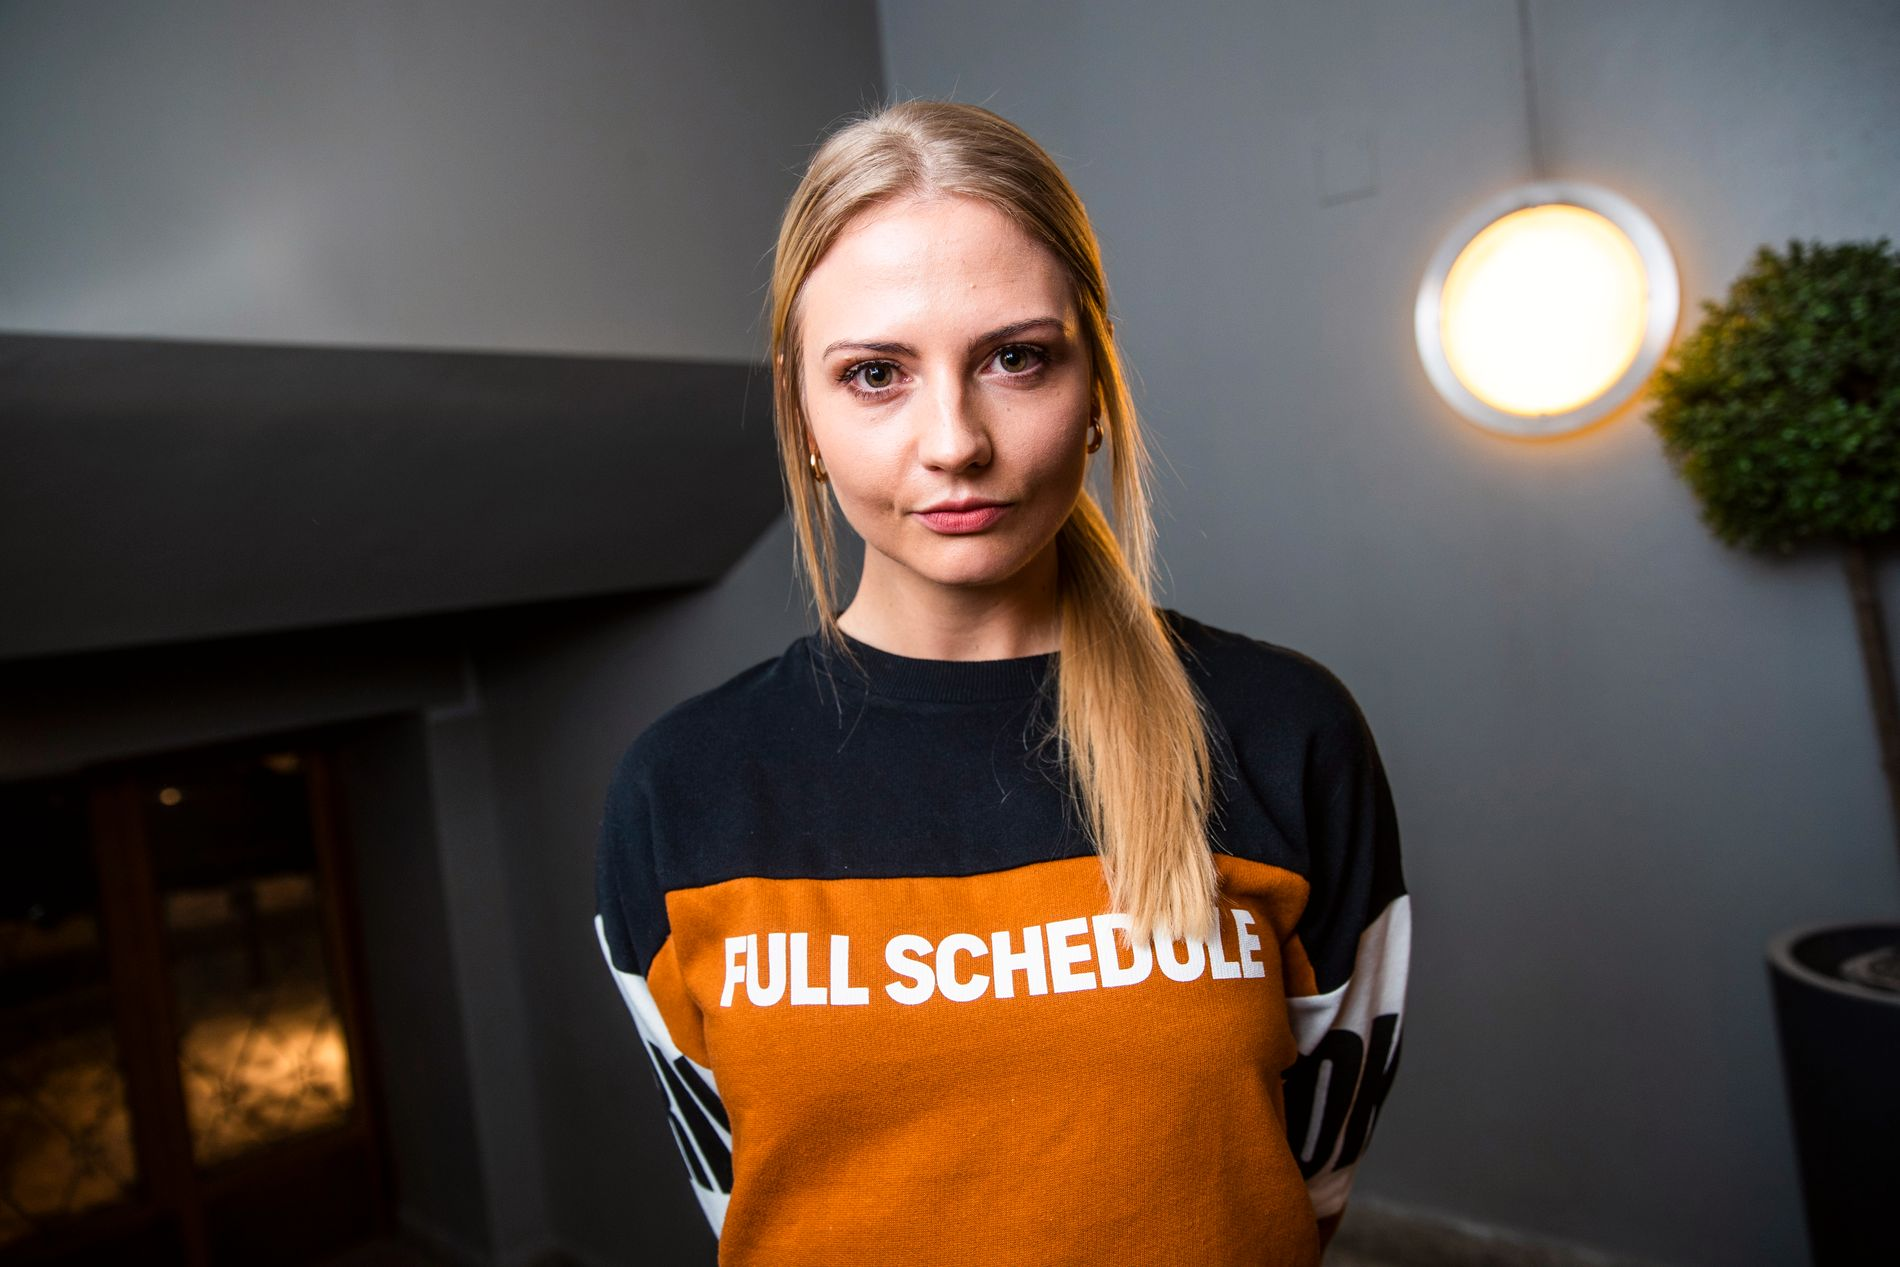 YNGST: Kine Olsen Vedelden er tidenes yngste «Mesternes mester»-deltager, og la på cheerleadingen i 2016.